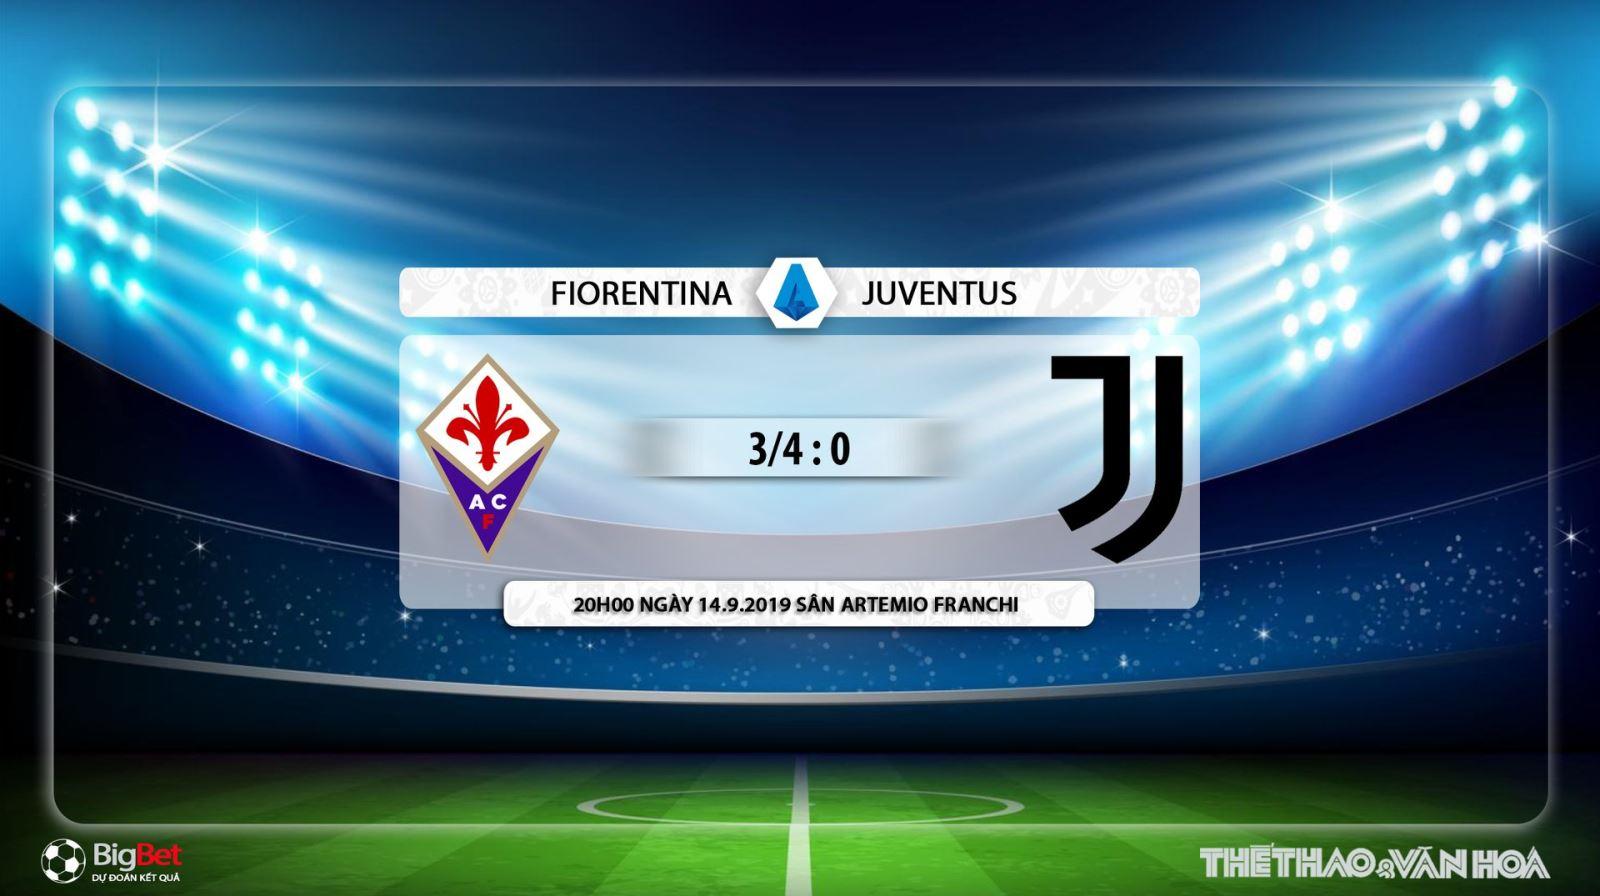 Fiorentina vs Juventus, Juventus, Fiorentina, trực tiếp bóng đá  Fiorentina vs Juventus, soi kèo  Fiorentina vs Juventus, lịch thi đấu của Juventus, xem trực tiếp bóng đá, serie a, bong da, bóng đá